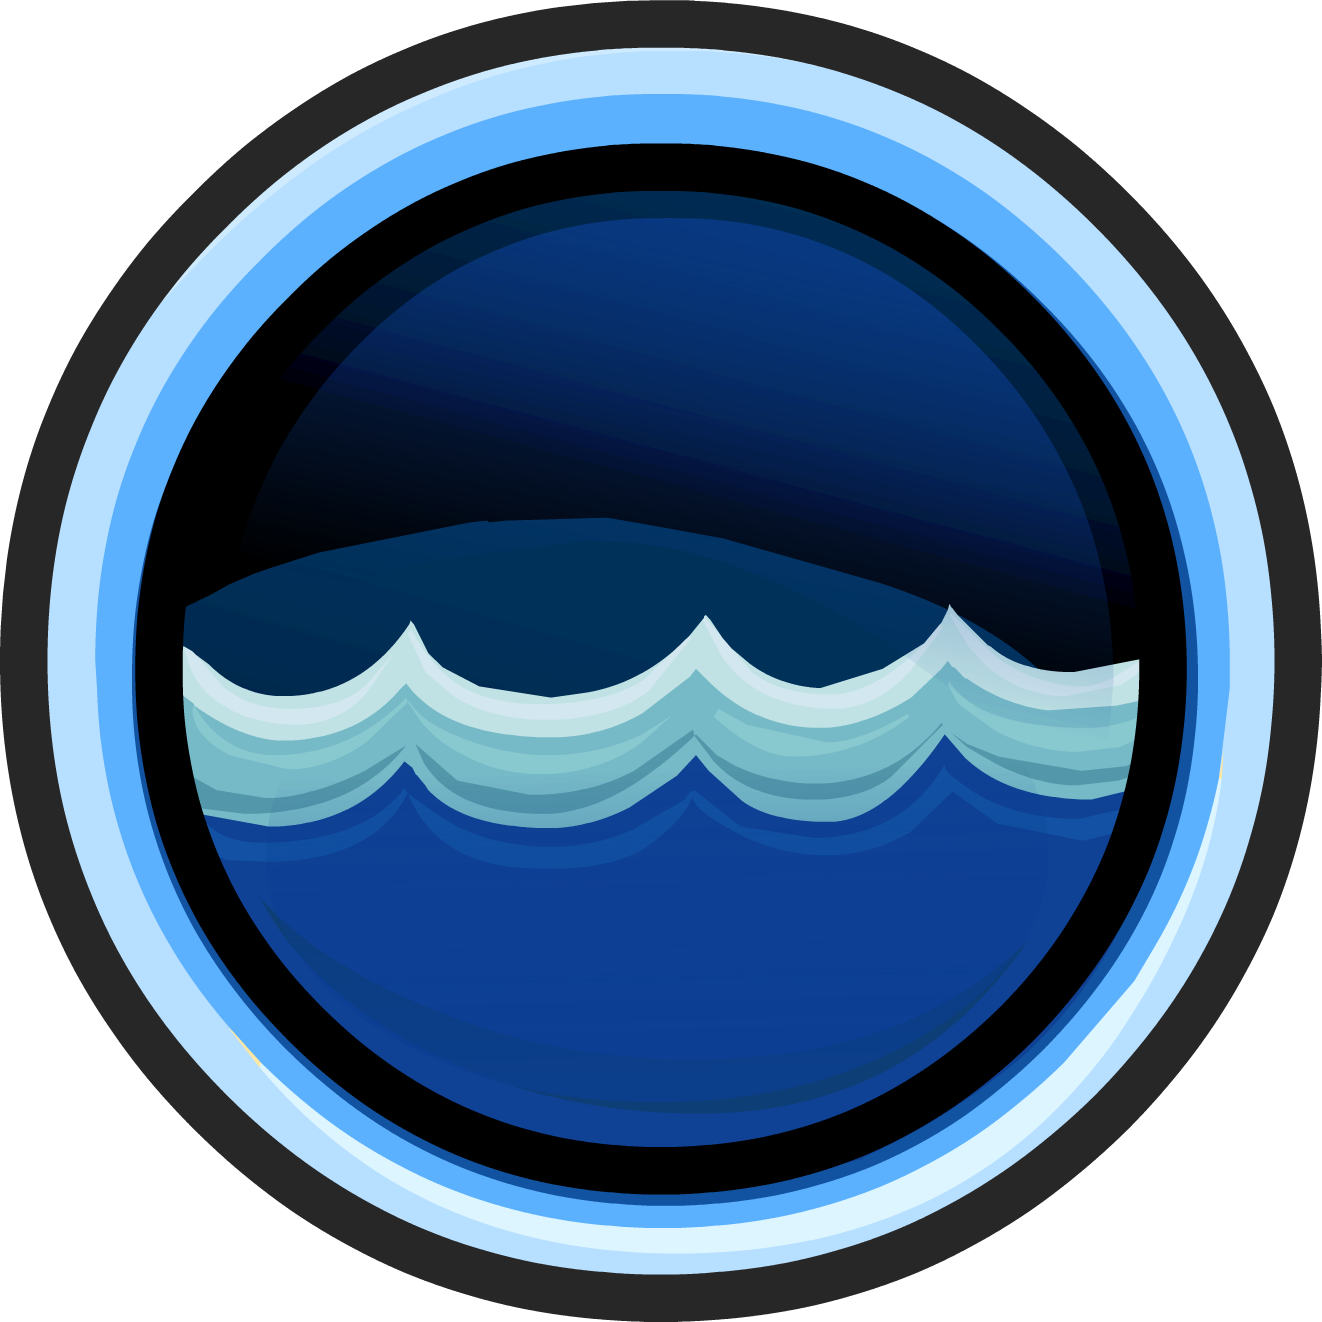 Water elemental symbol buycottarizona Gallery